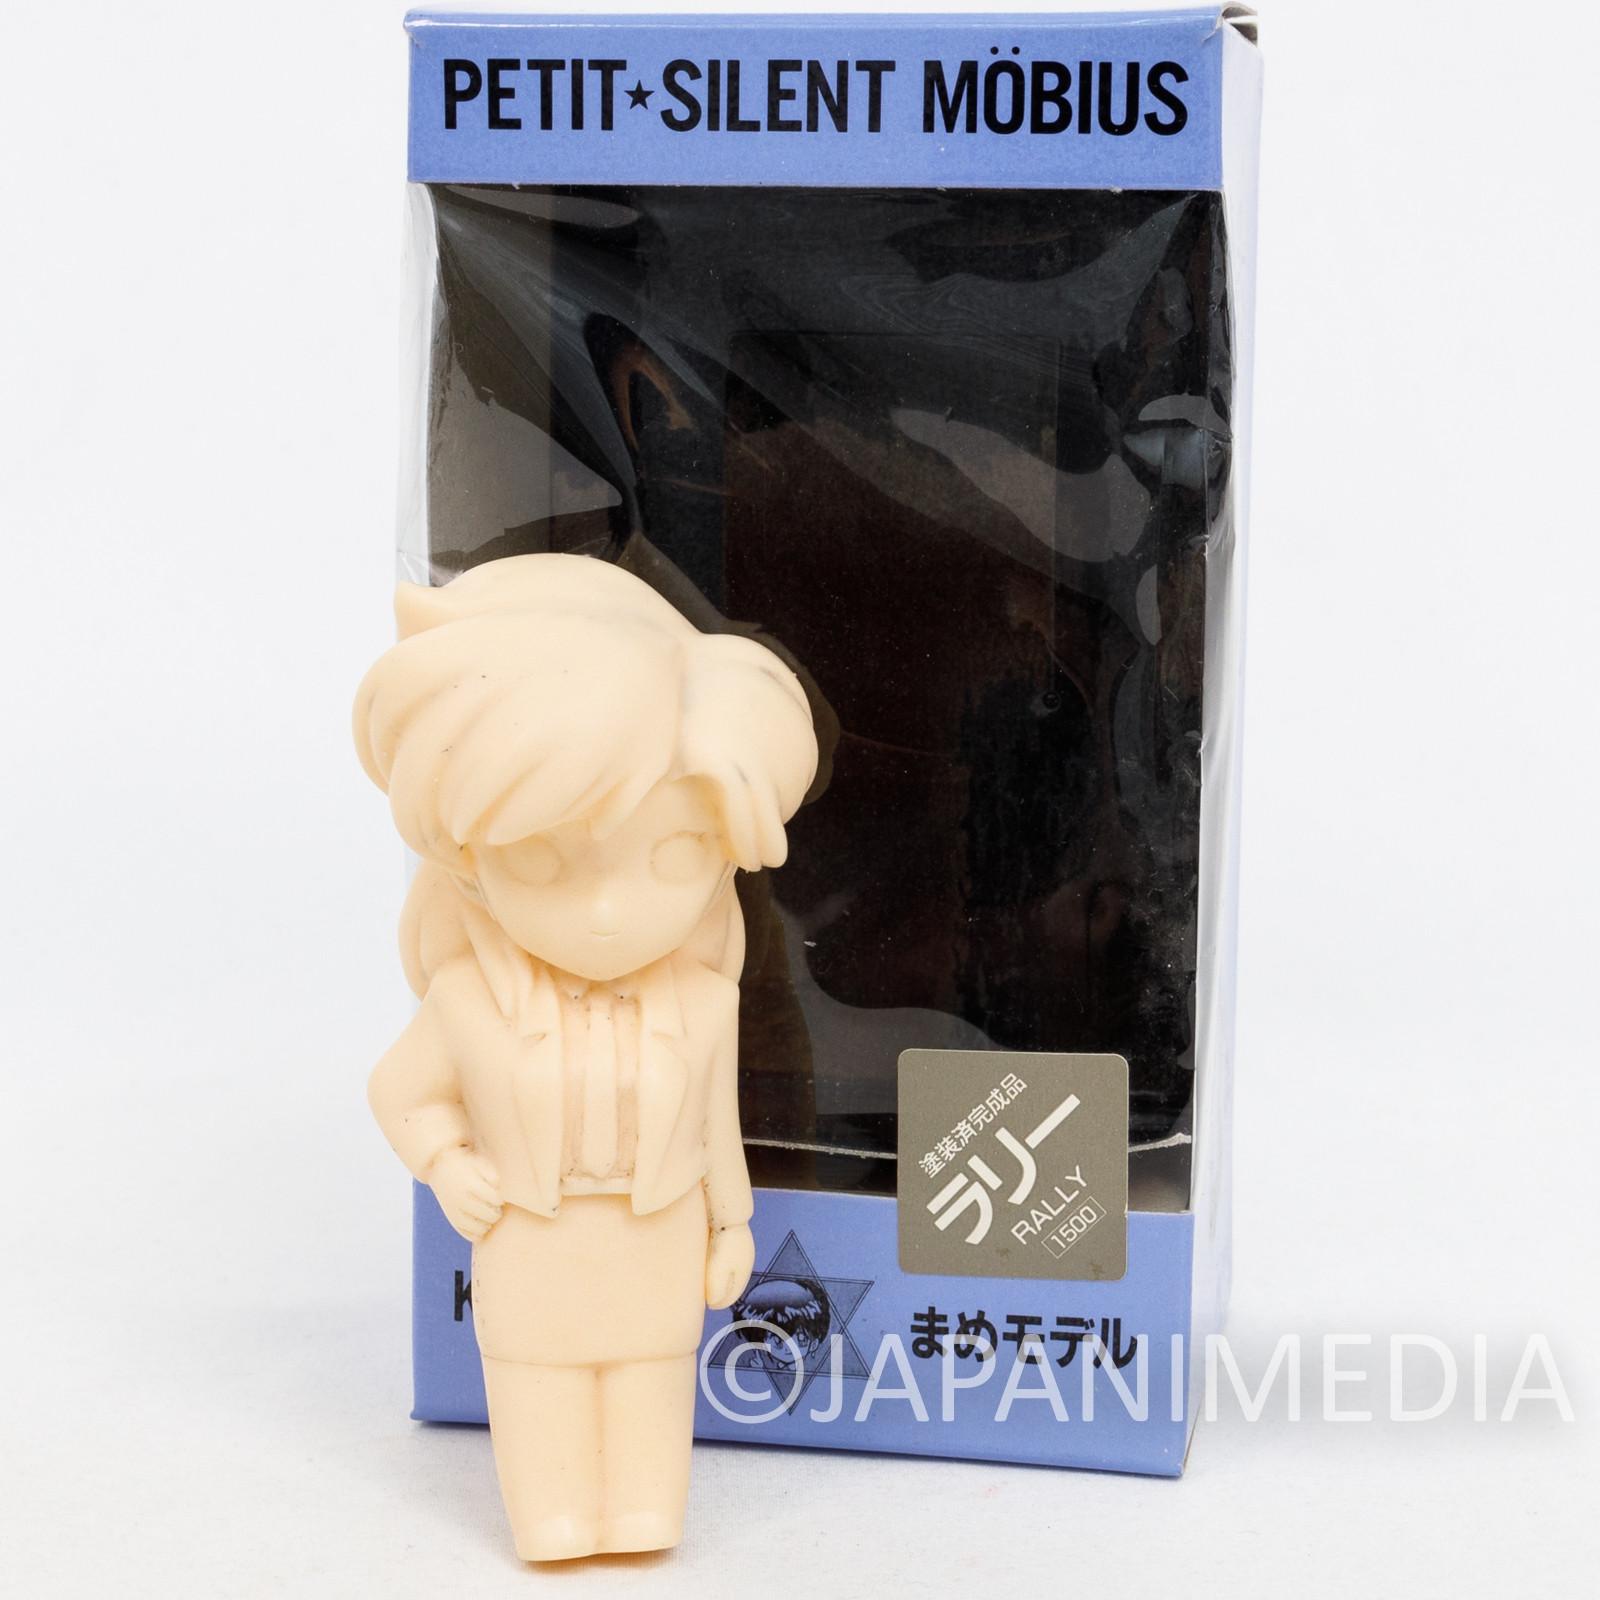 Silent Mobius Rally Cheyenne Petit Resin Cast Model Kit Figure Kaiyodo JAPAN